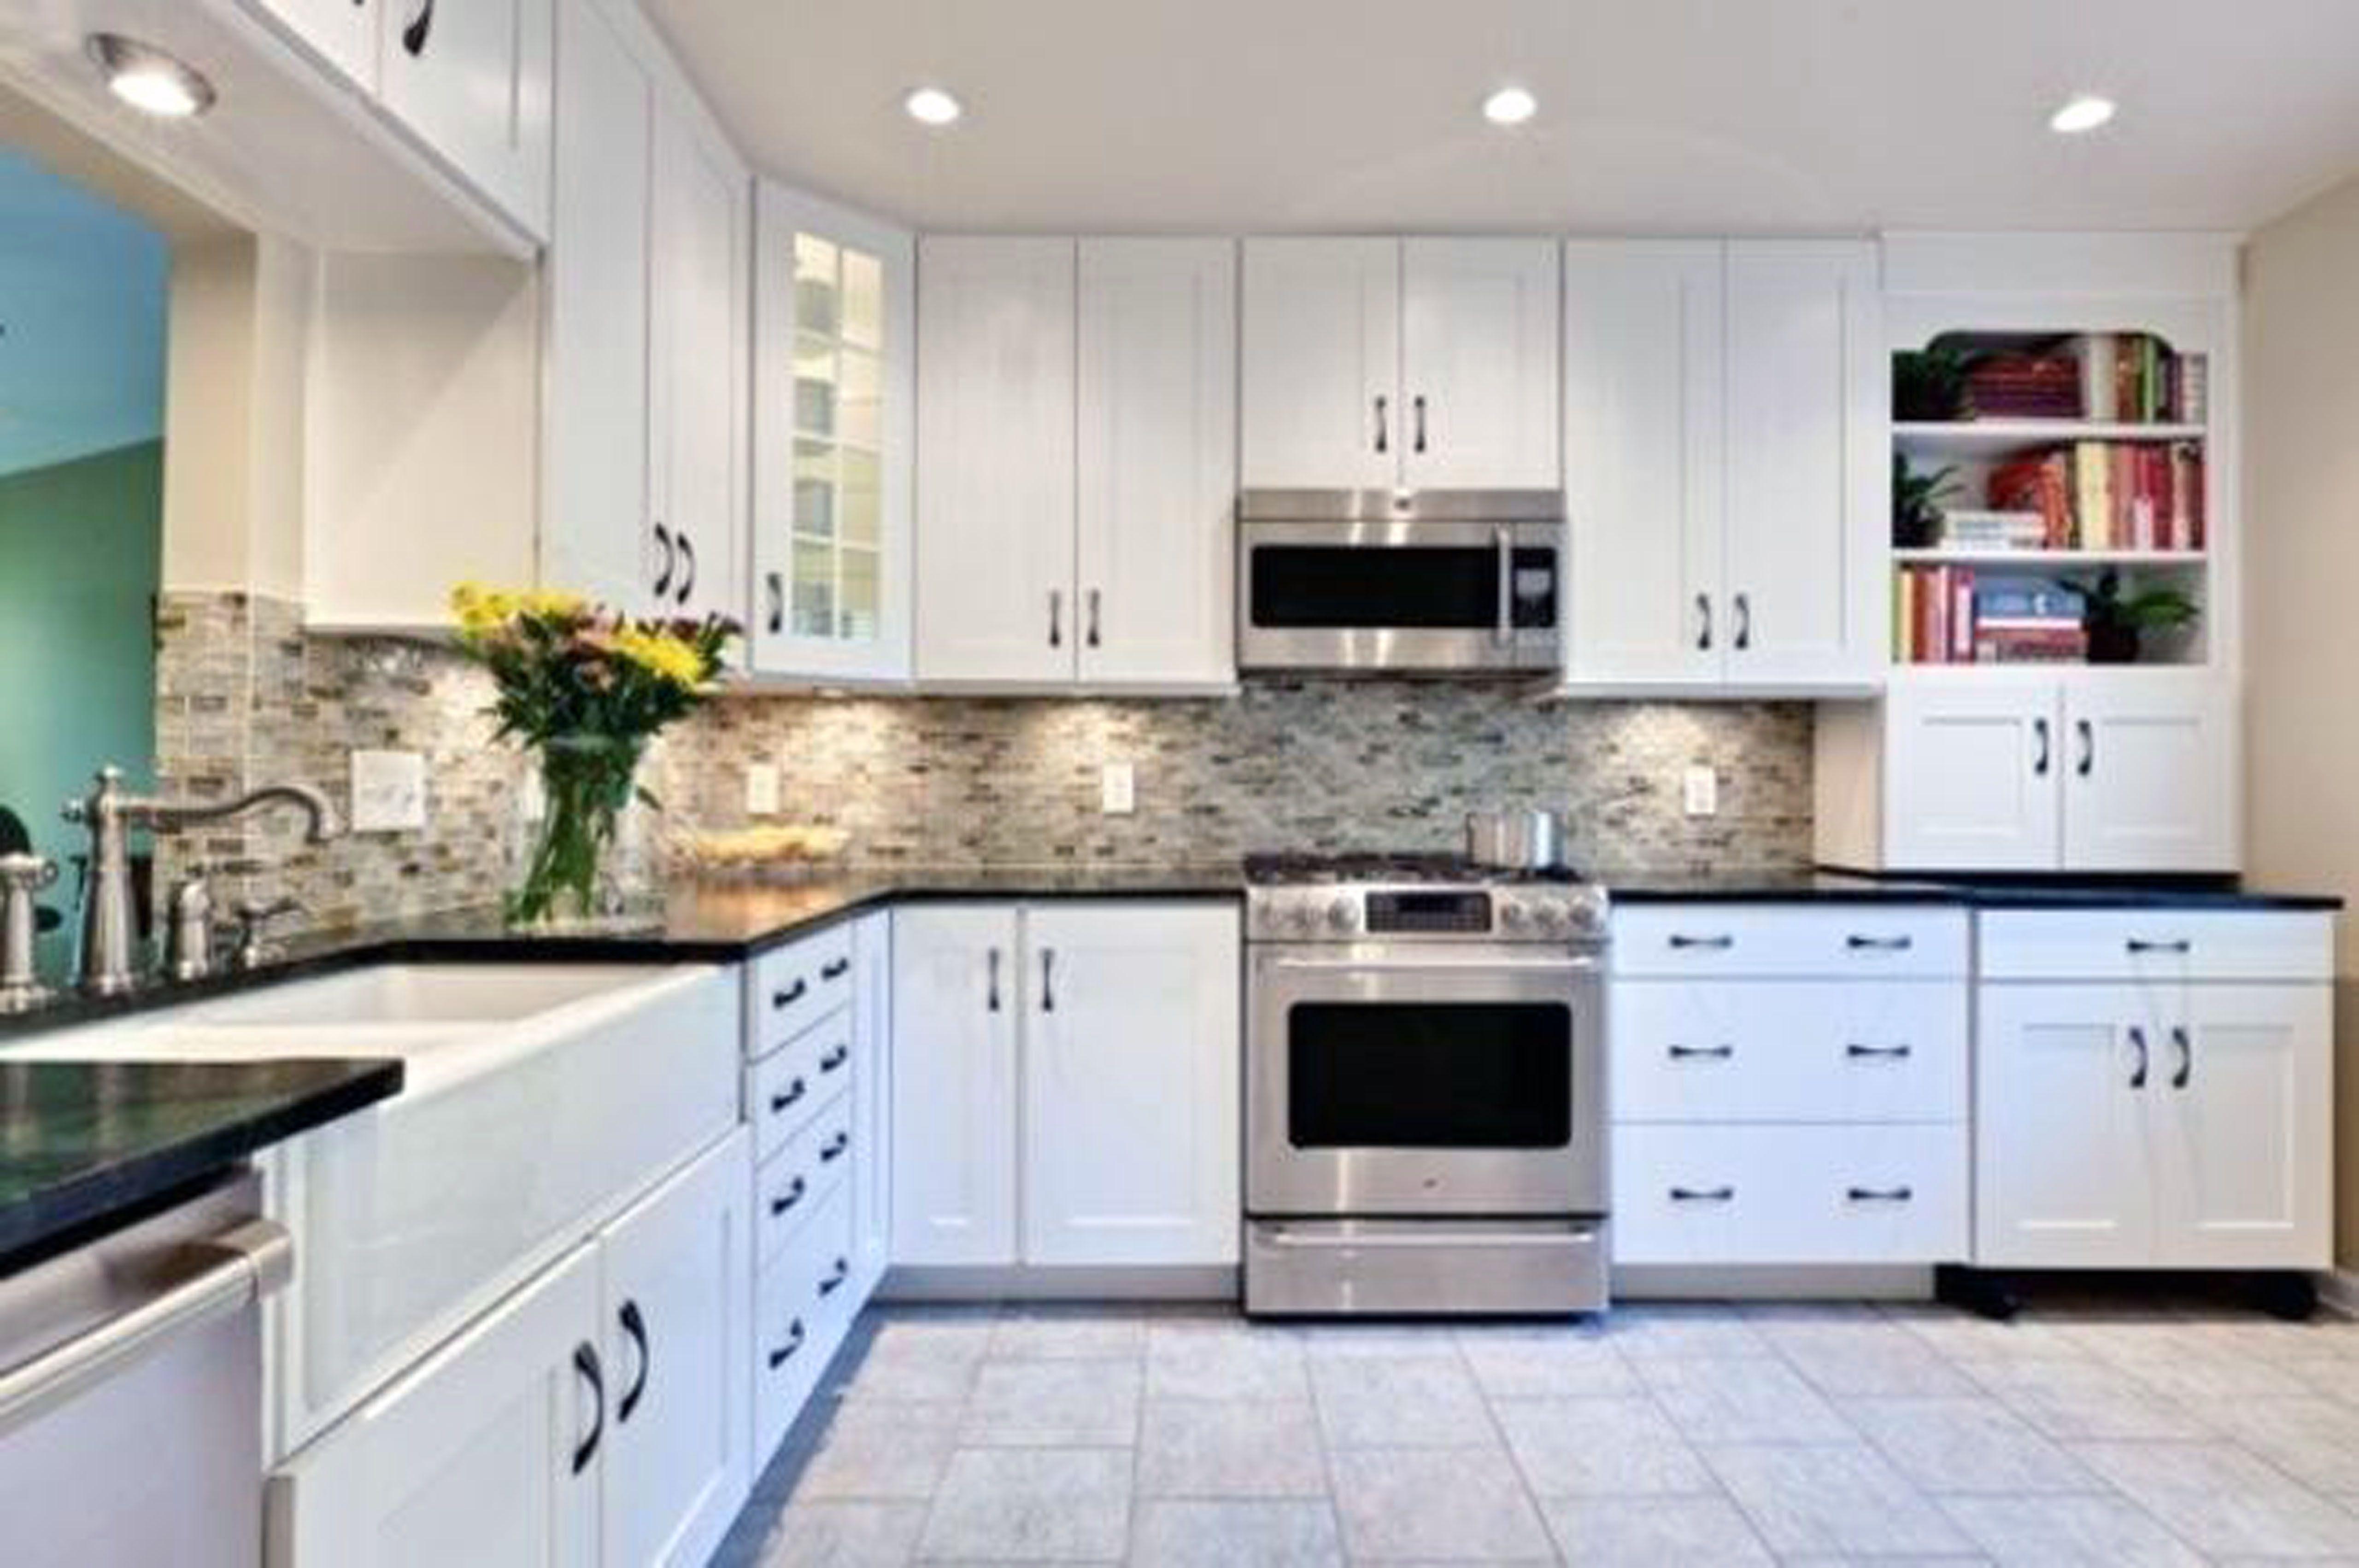 Kitchen Backsplash Ideas White Cabinets Black Countertops White Cabinets Black Countertops White Modern Kitchen Granite Countertops Kitchen